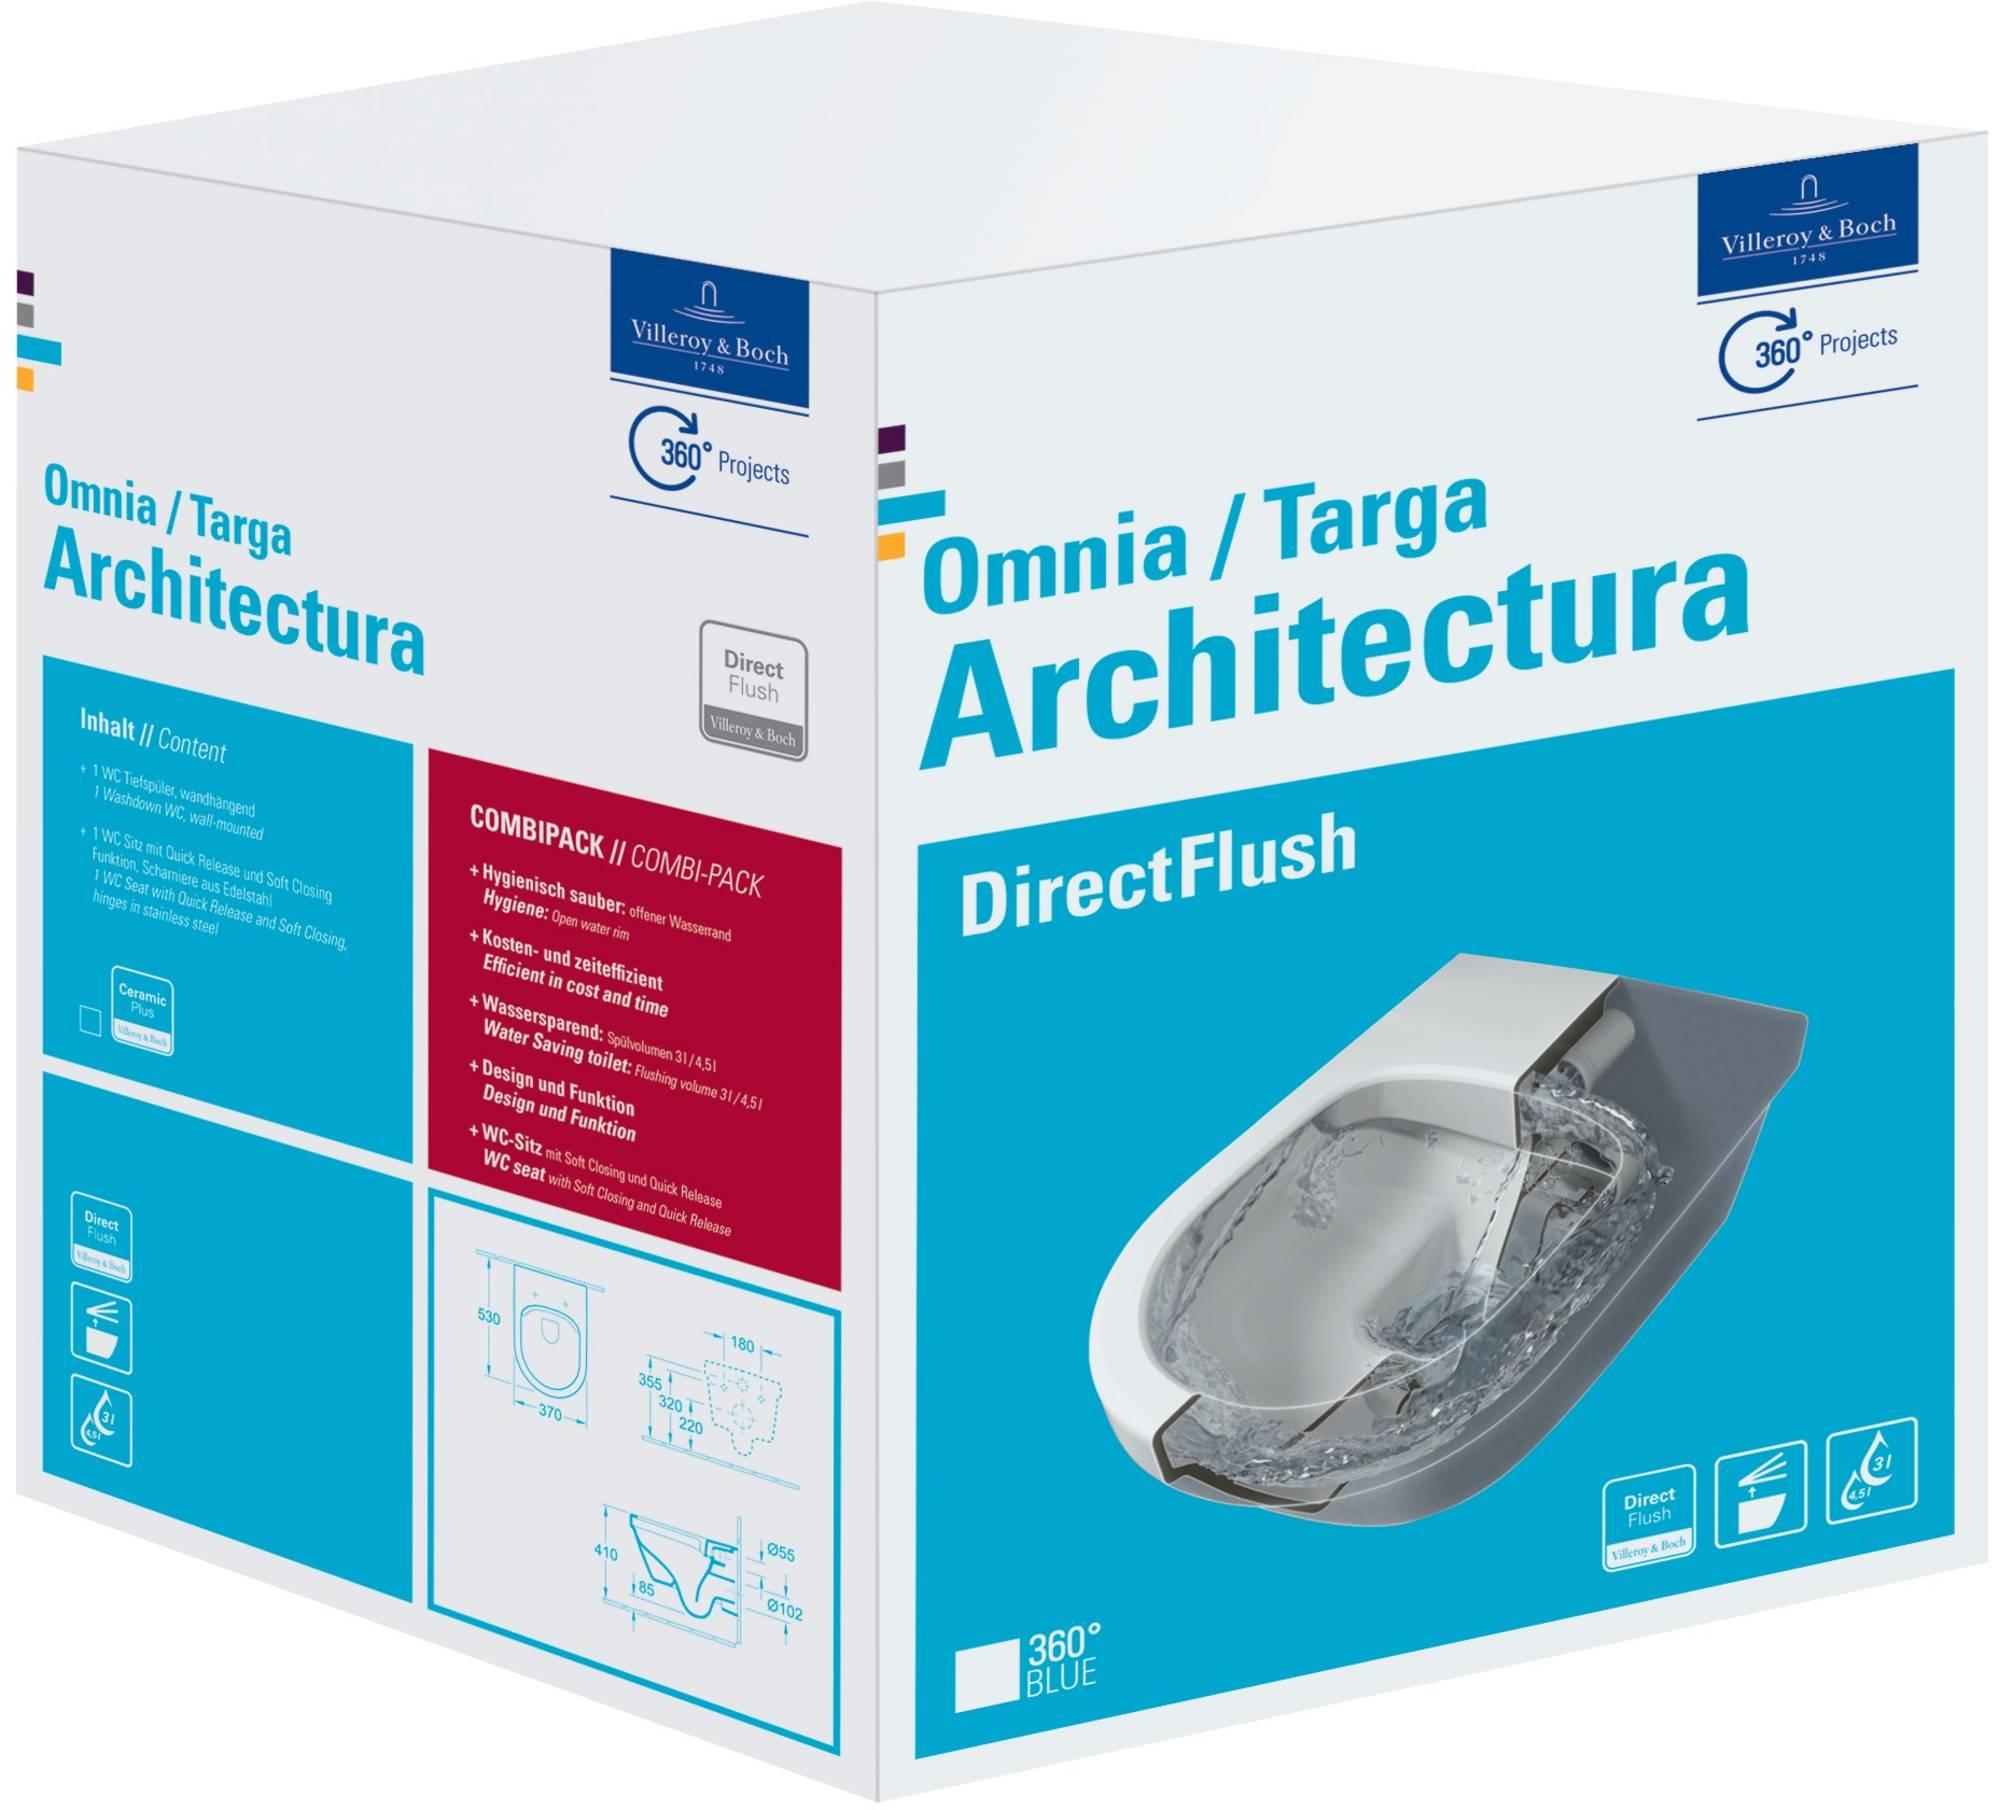 Villeroy & boch Omnia architectura wandcloset direct flush combi-pack met zitt.sc+qr, wit